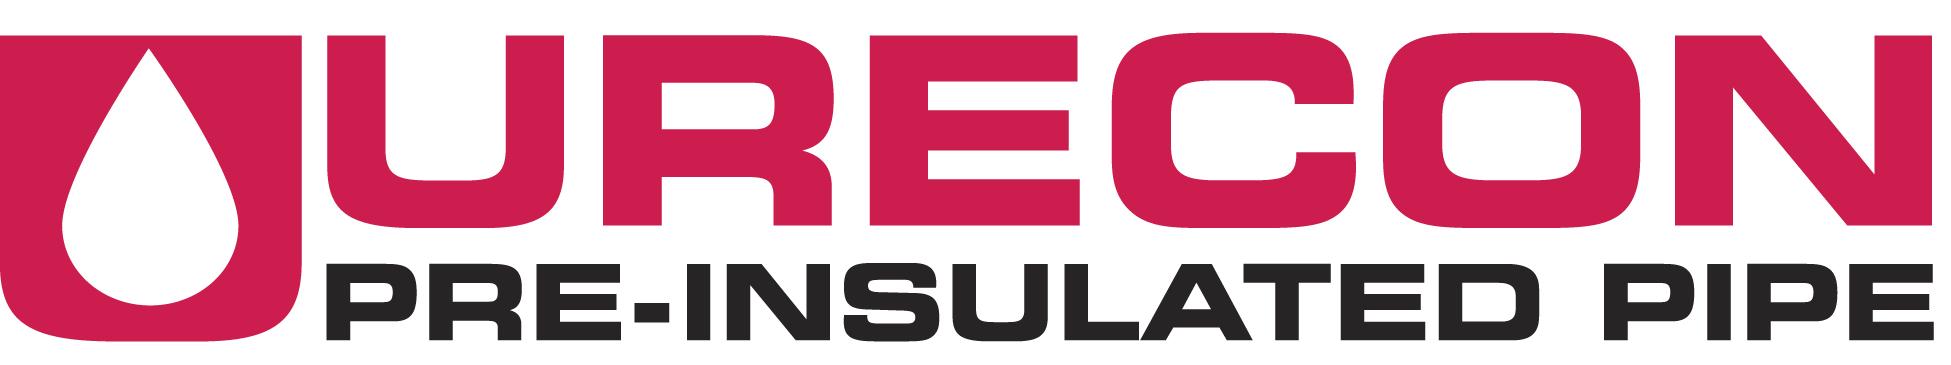 urecon logo FINAL rgb